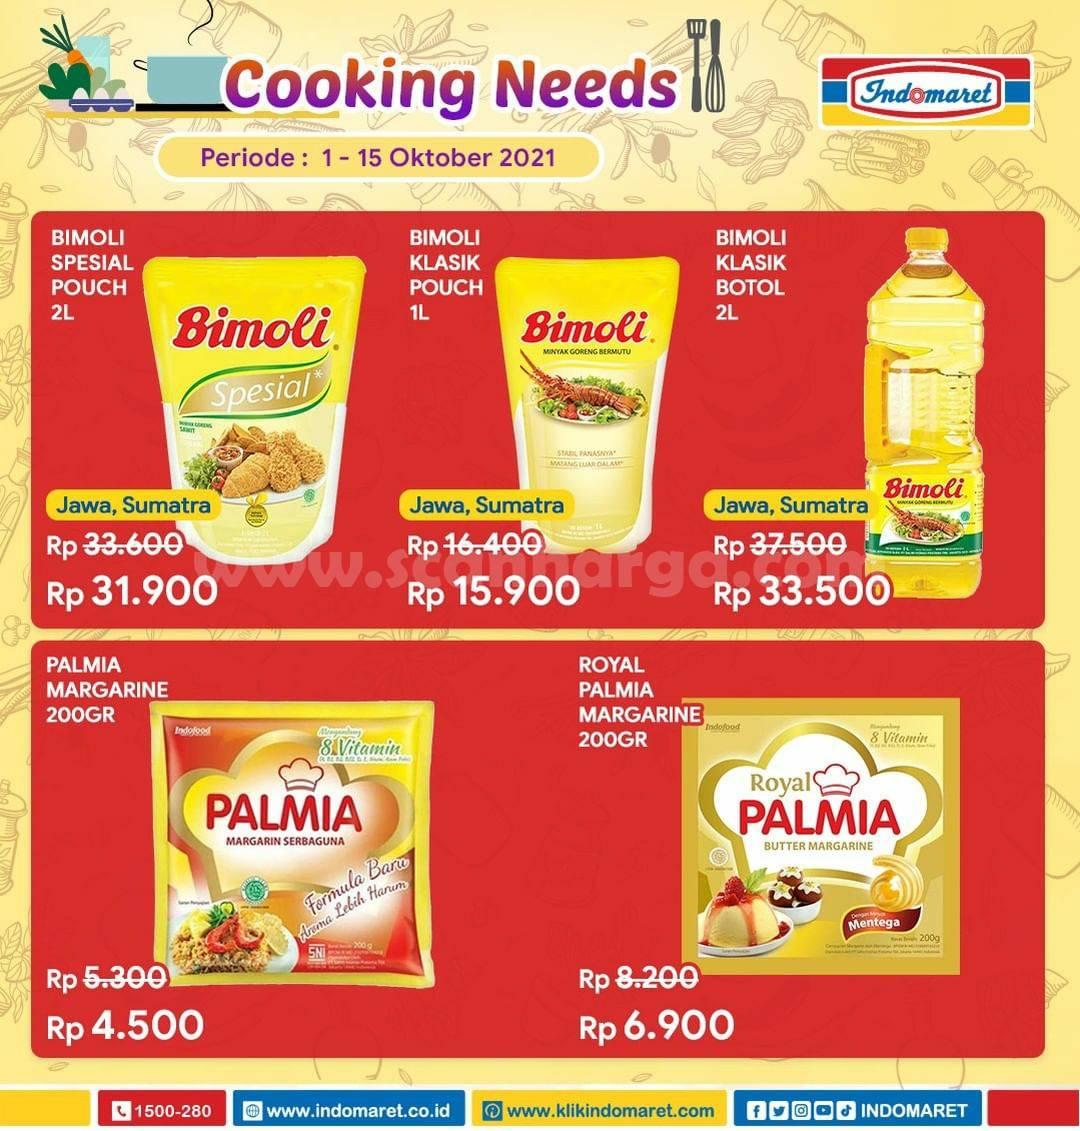 Promo Indomaret Cooking Needs hingga 15 Oktober 2021 1